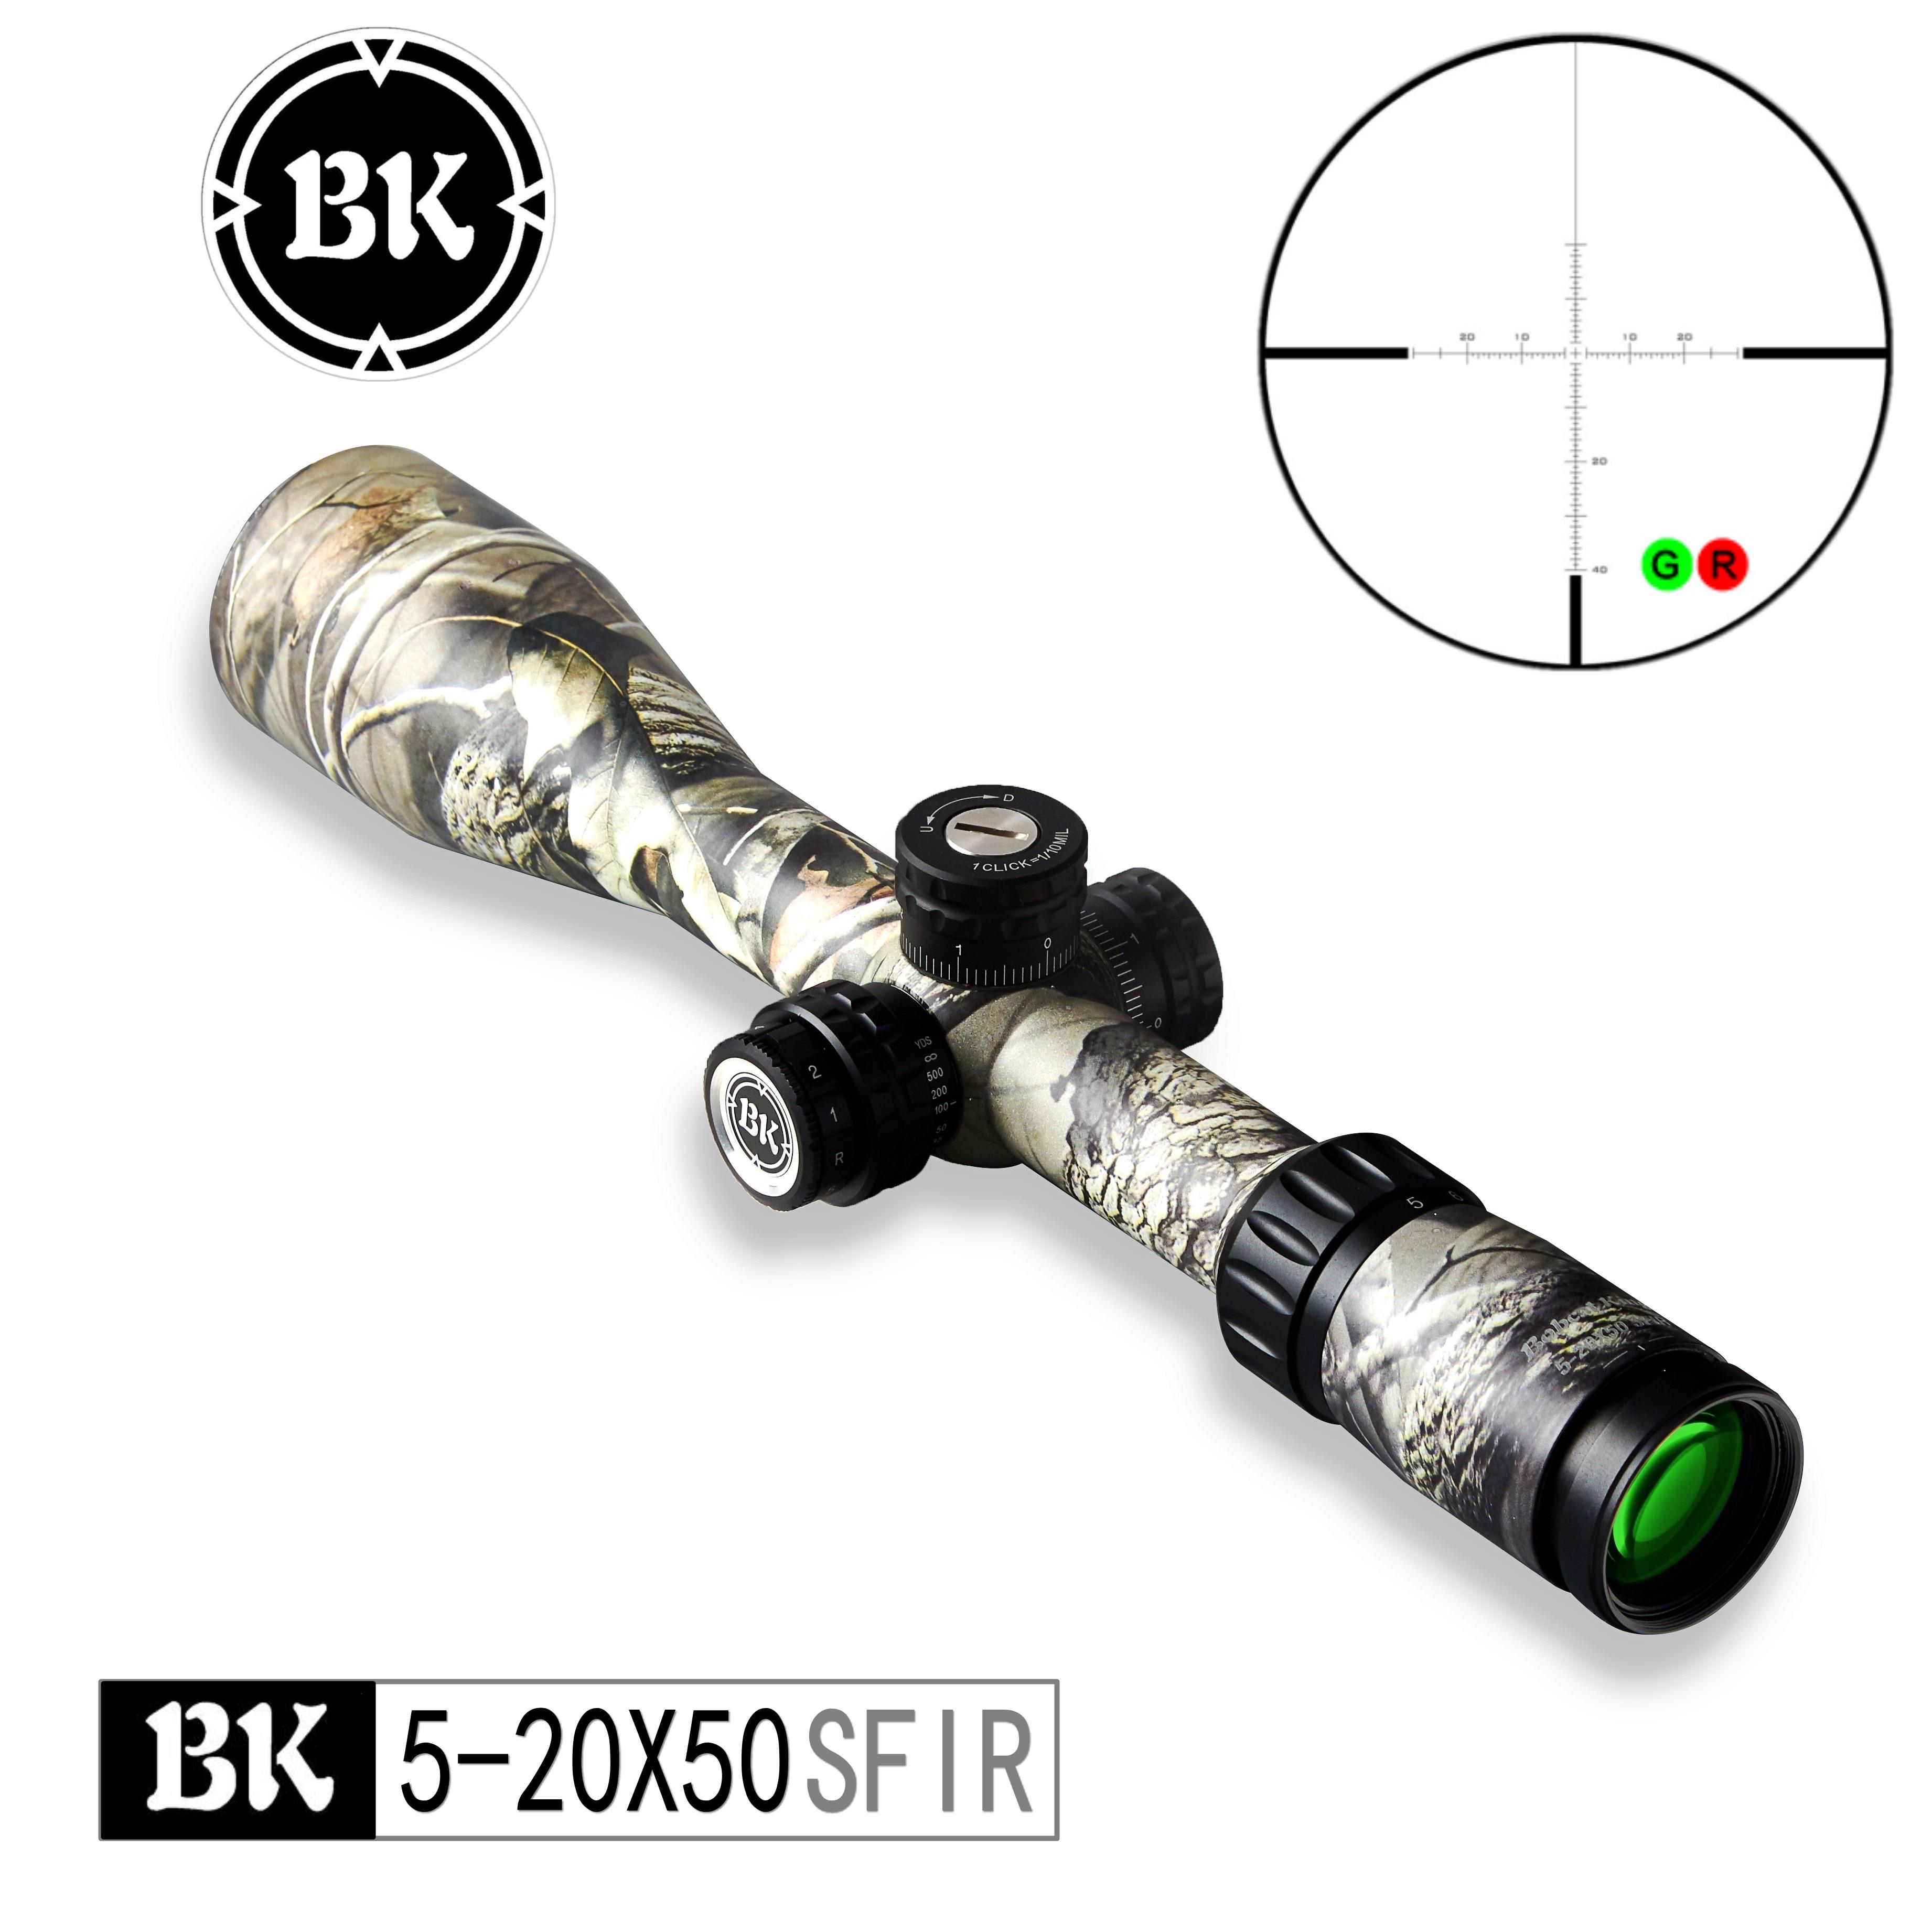 Bobcat King Optics BK 5-20X50 SFIR Camouflage Appearance Tactical Optical Sight Sniper Hunting Rifle Aiming Air Gun Riflescope